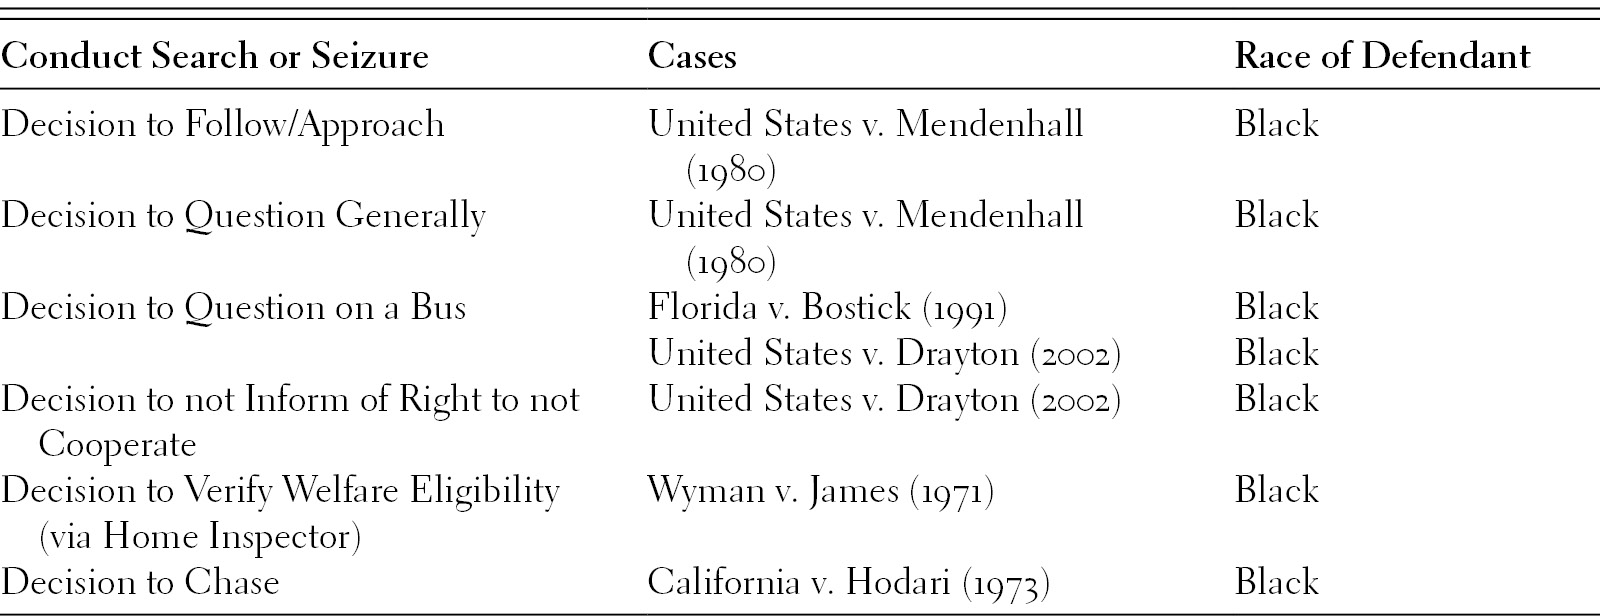 Discrimination (Part V) - The Cambridge Handbook of Policing